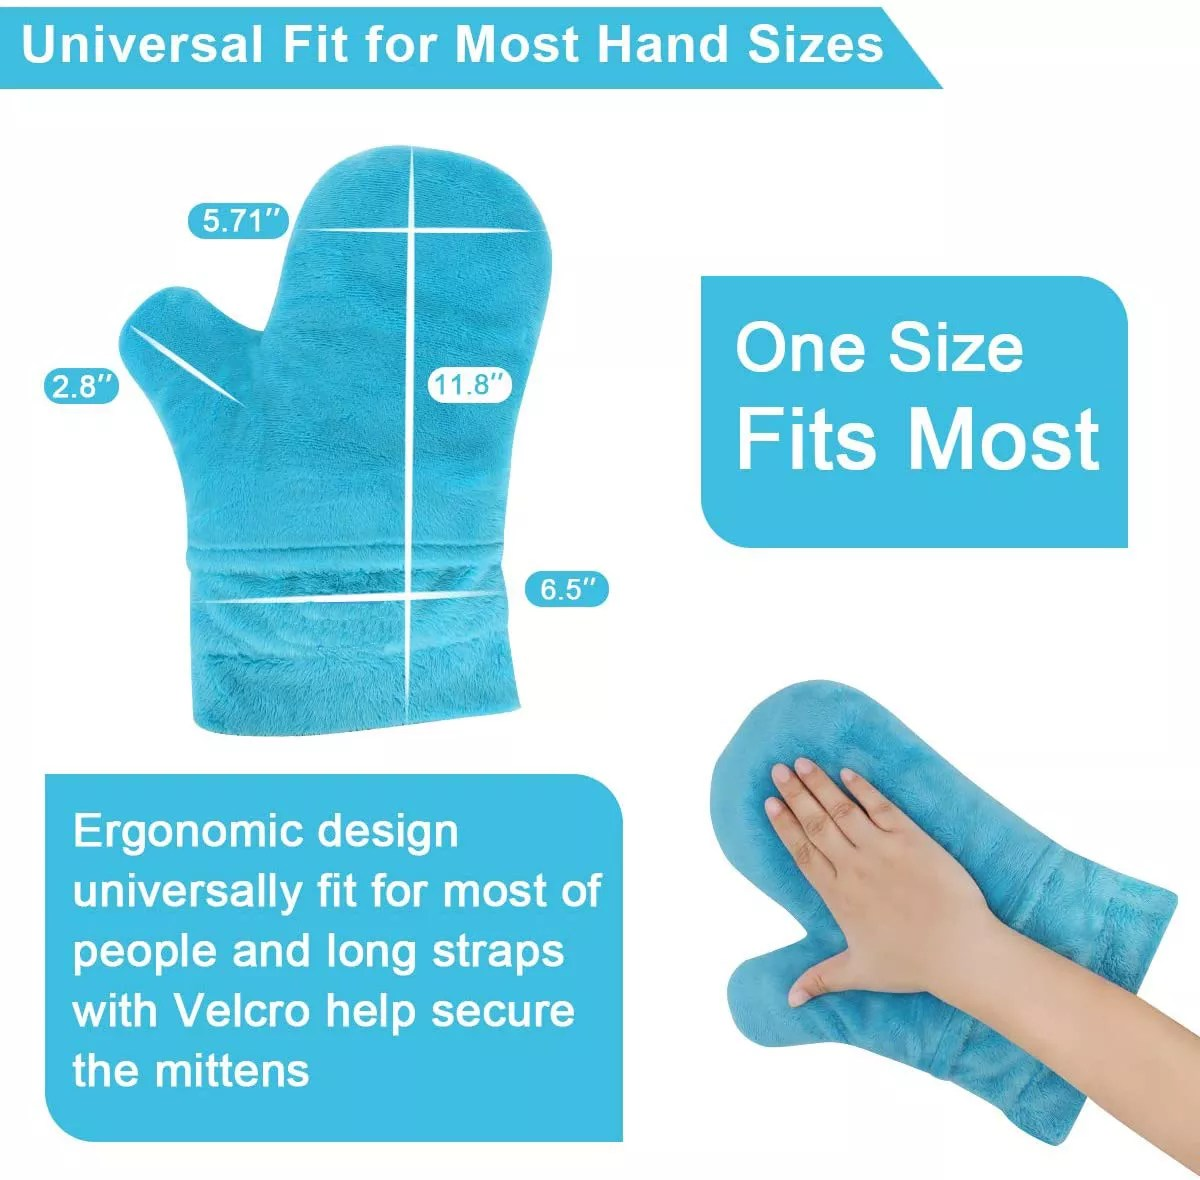 therapy relieve heat arthritis gloves heated joint pain hands warmers arthritis trigger heating mittens microwave glove buy heat arthritis